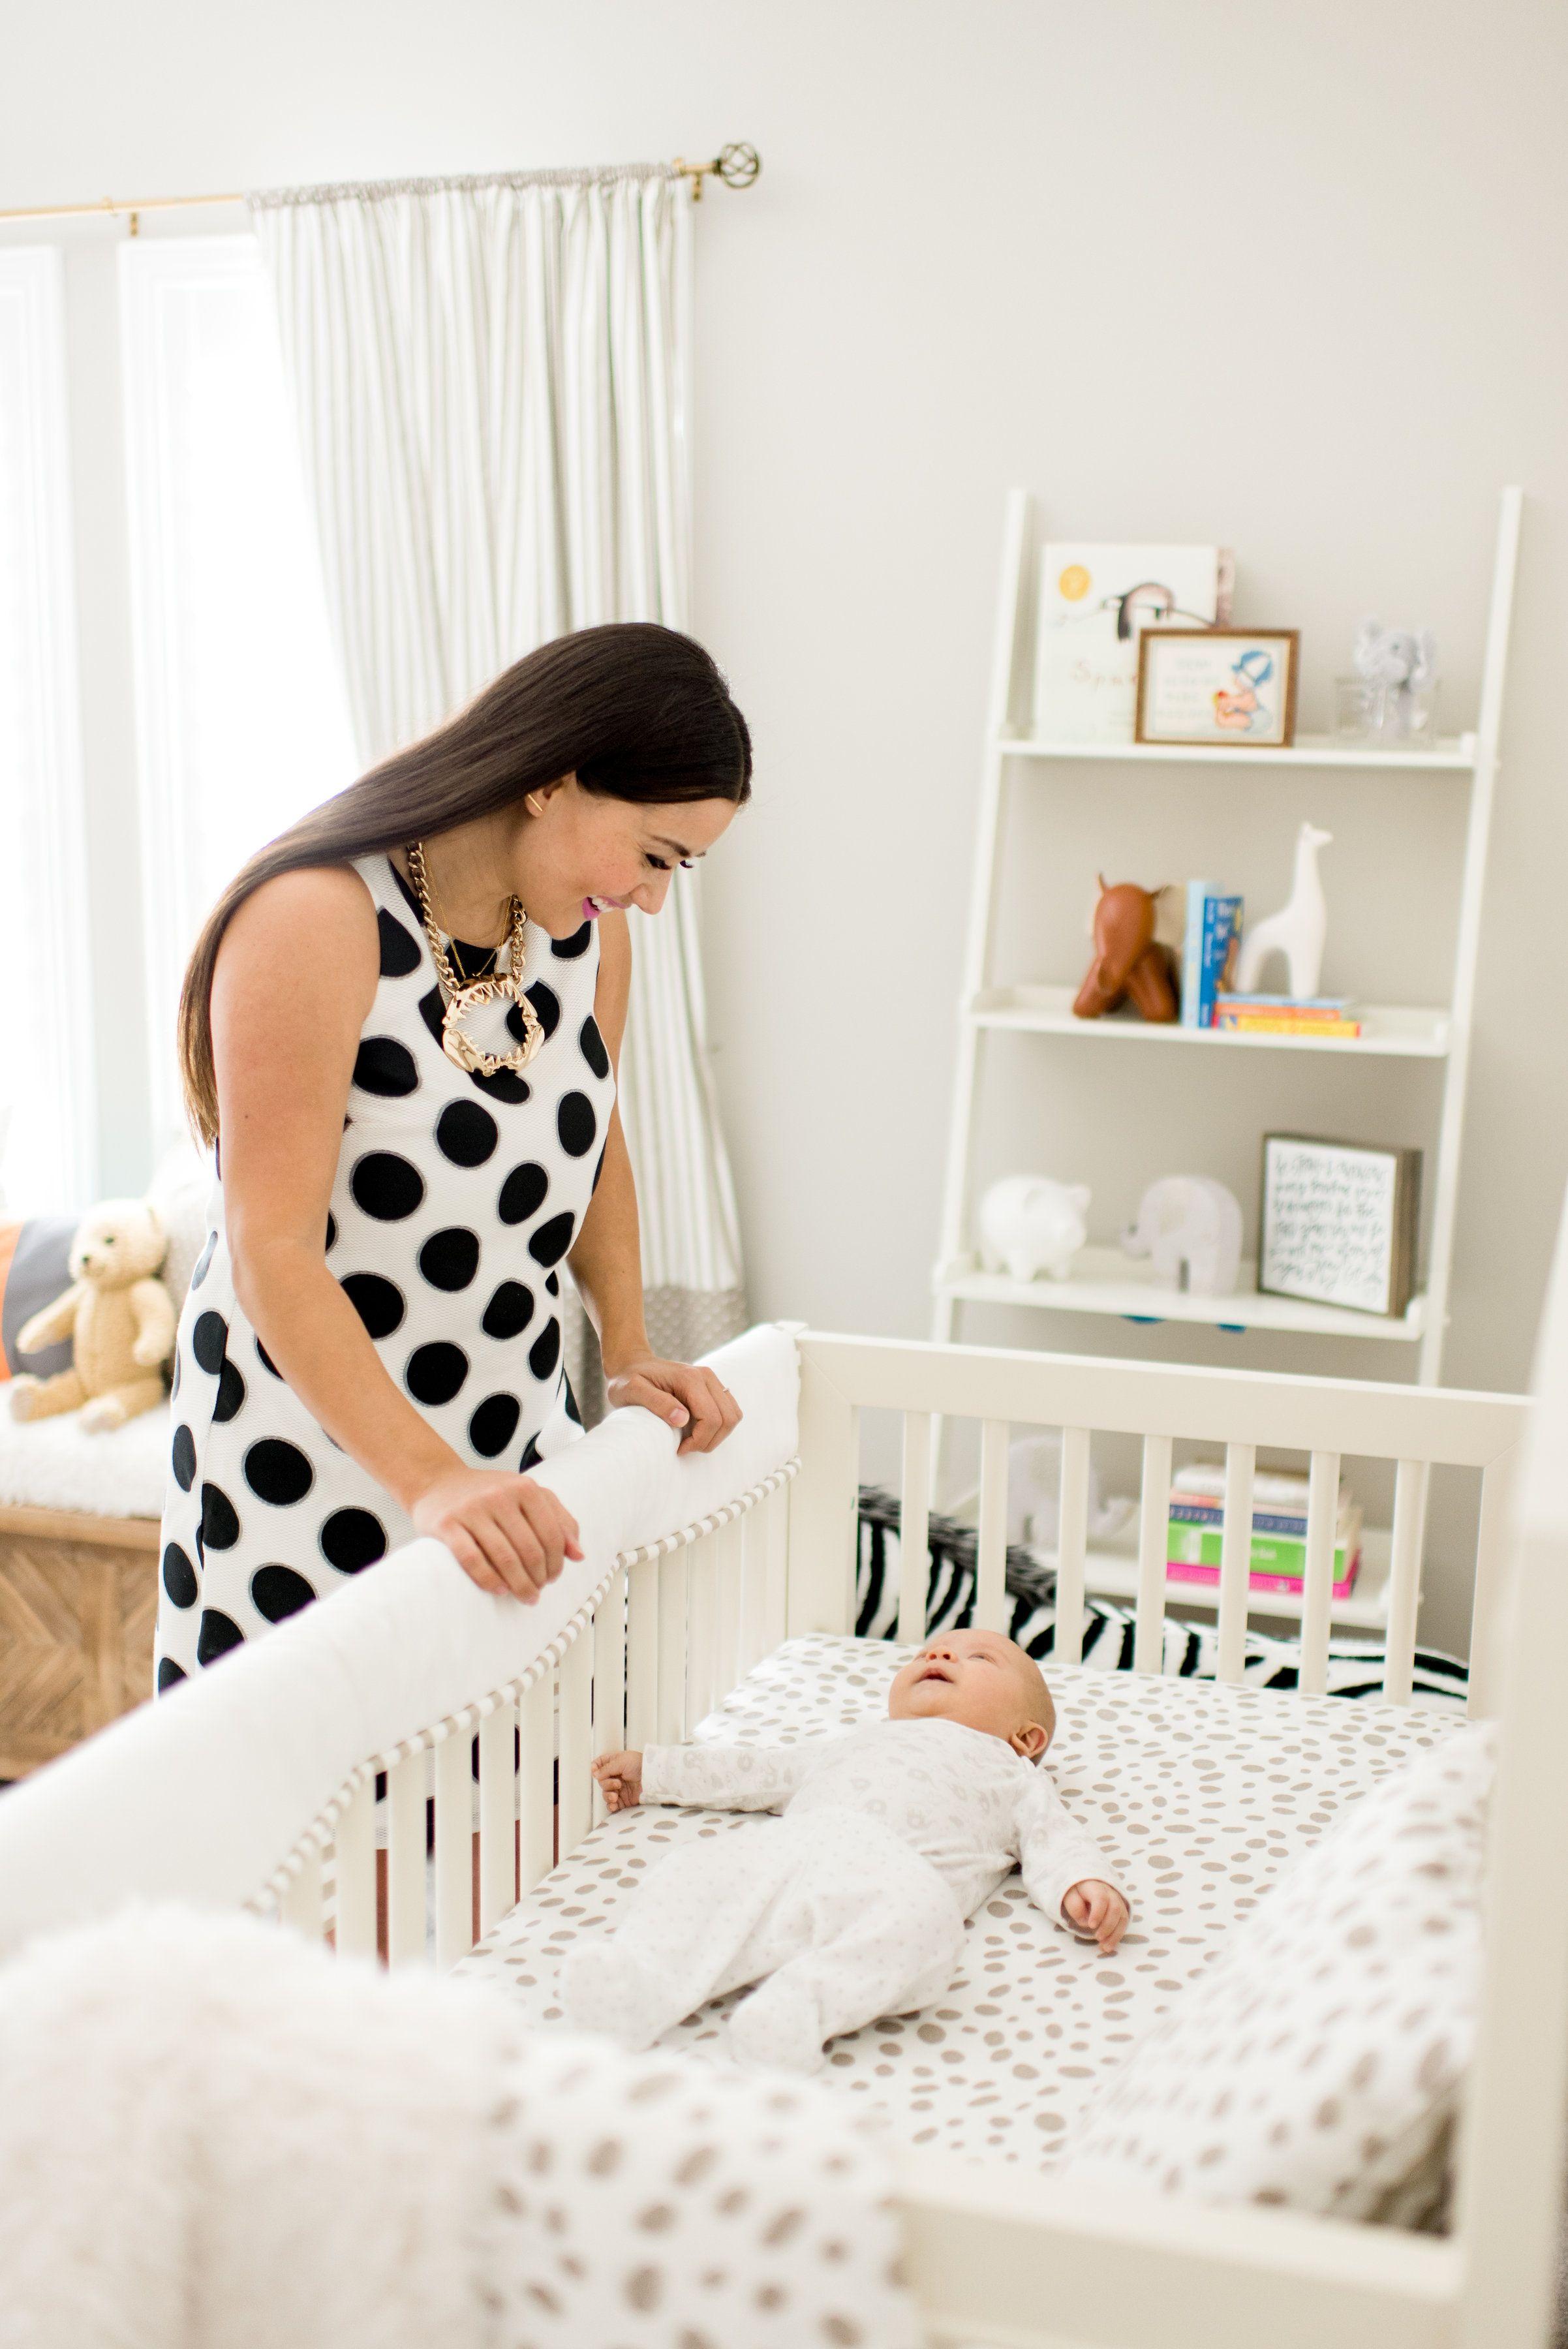 Project Nursery - Catherine and Sean Lowe's Nursery